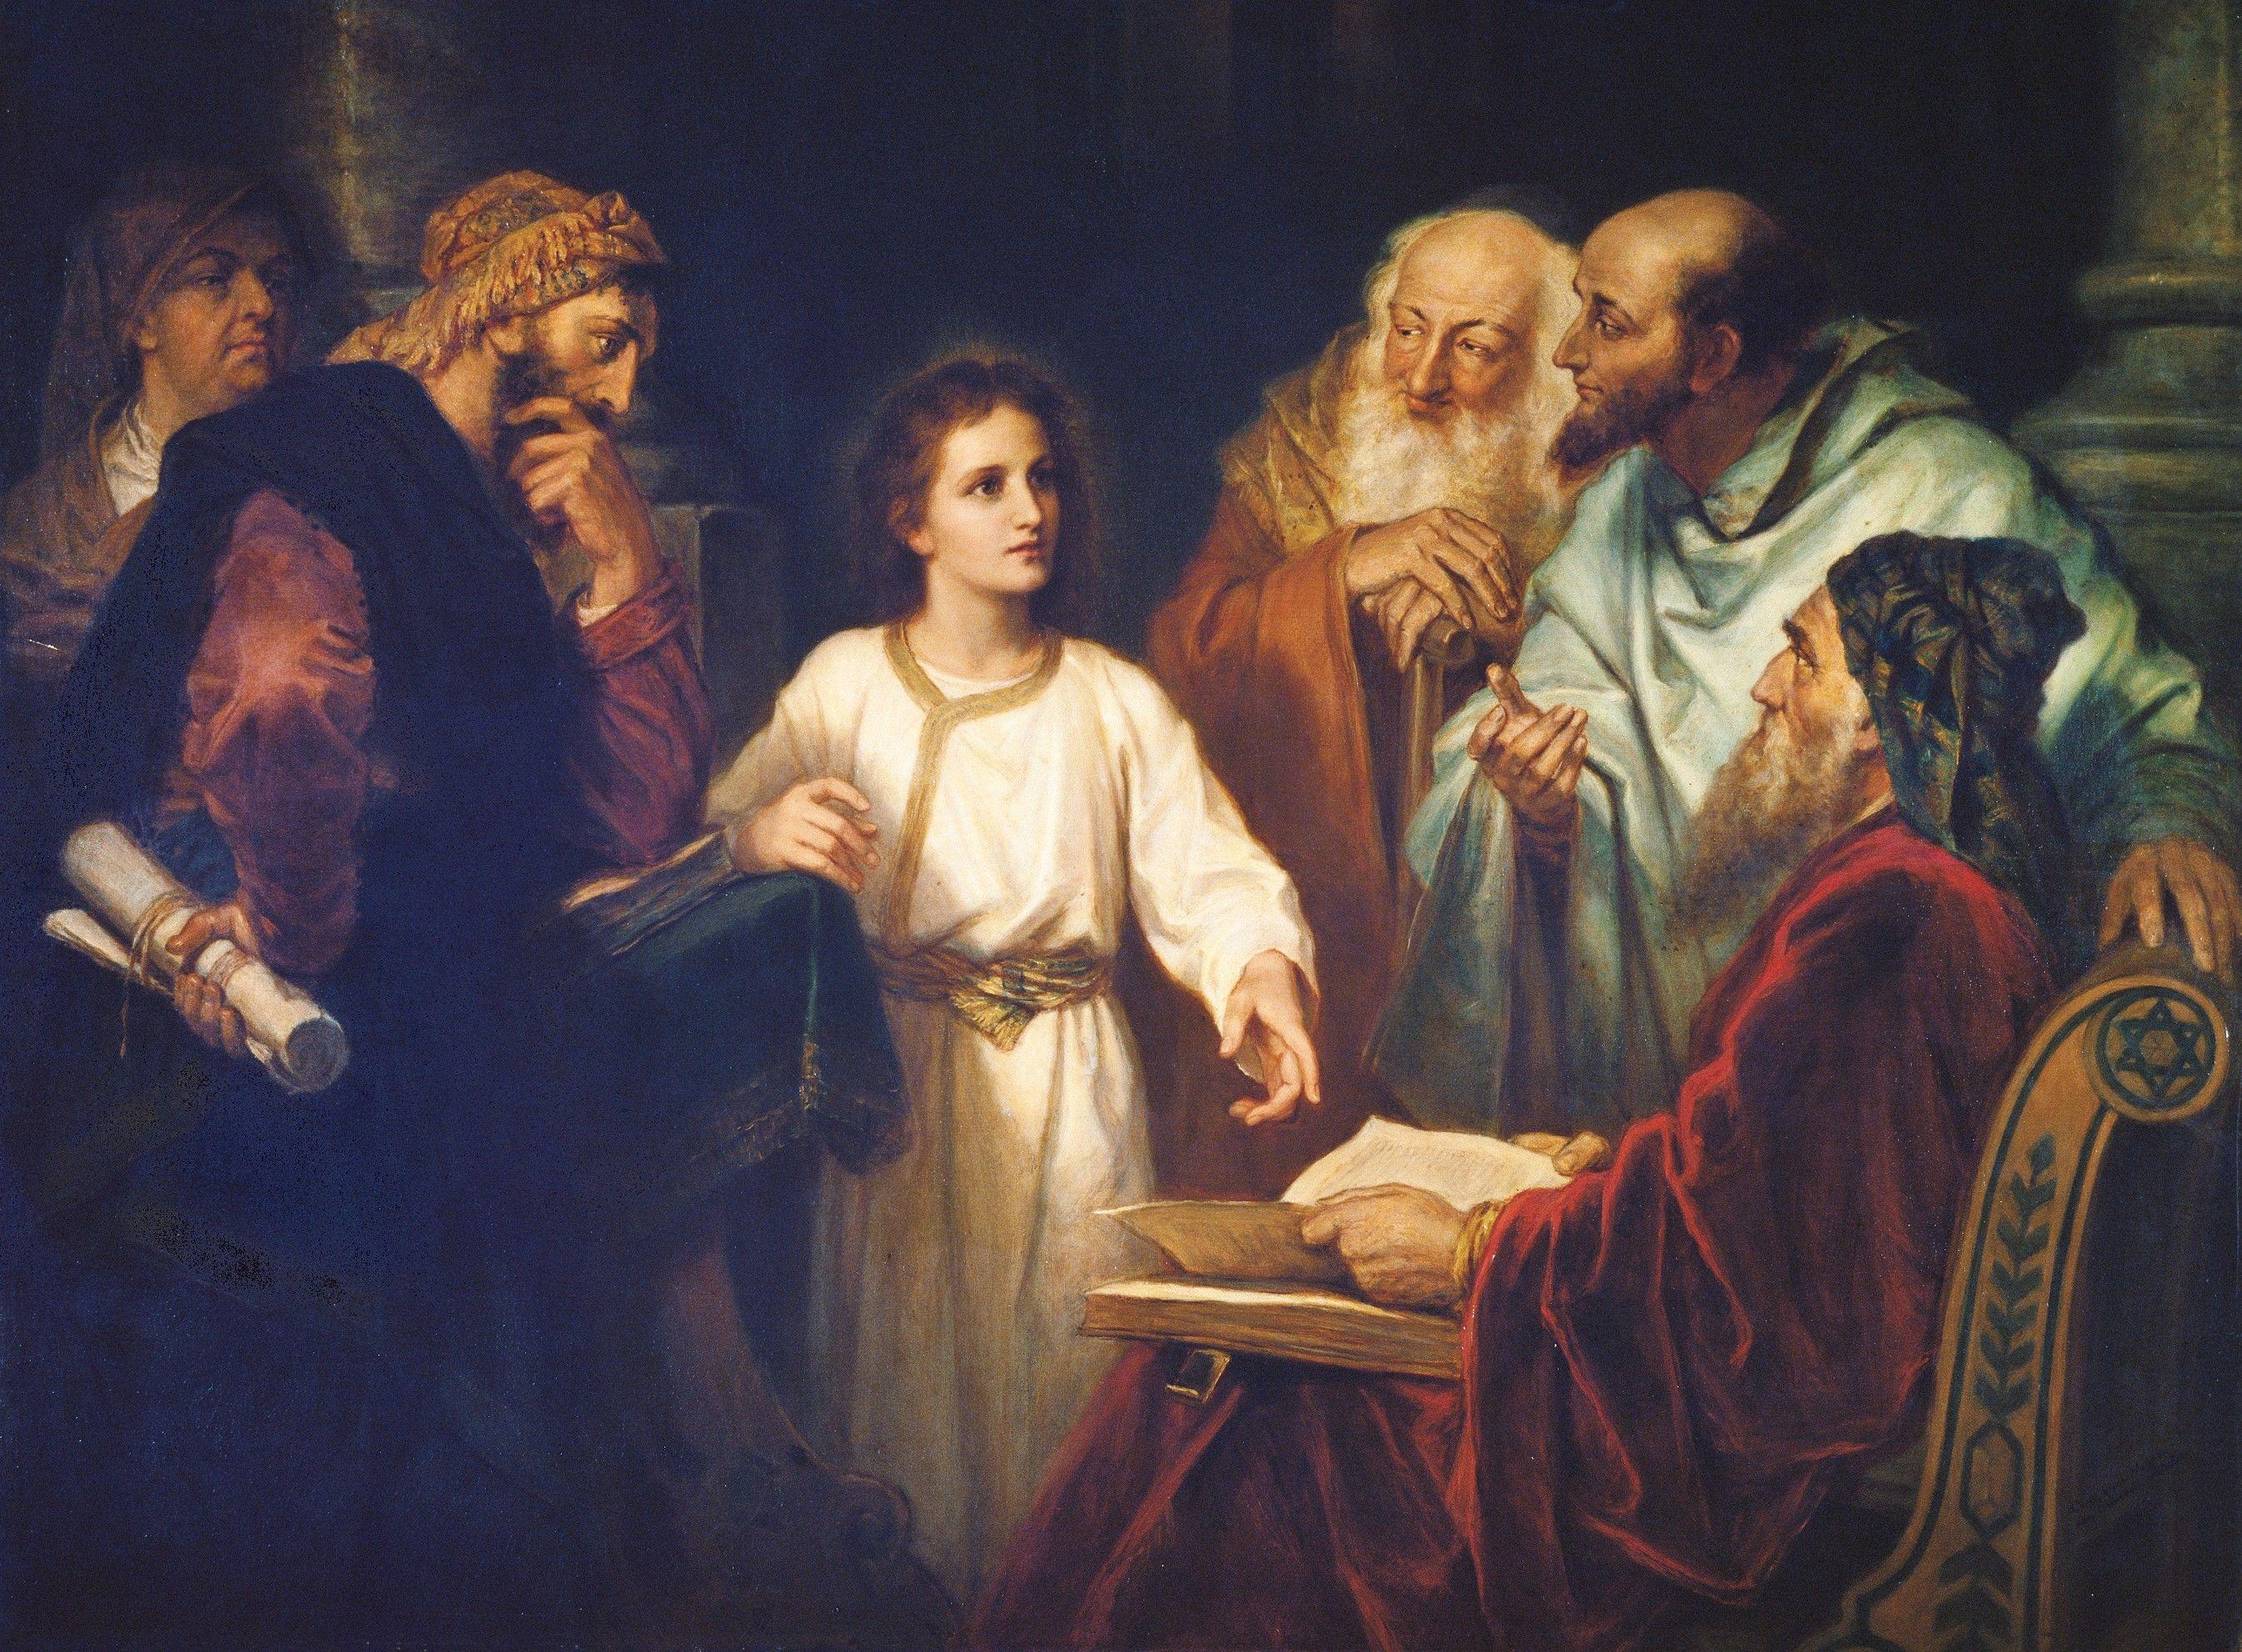 Boy Jesus in the Temple (Christ in the Temple), by Heinrich Hofmann (62500); GAK 205; GAB 34; Primary manual 1-17; Primary manual 2-13; Primary manual 7-06; Luke 2:41–52; Joseph Smith Translation, Luke 2:46 (in Luke 2:46, footnote c)